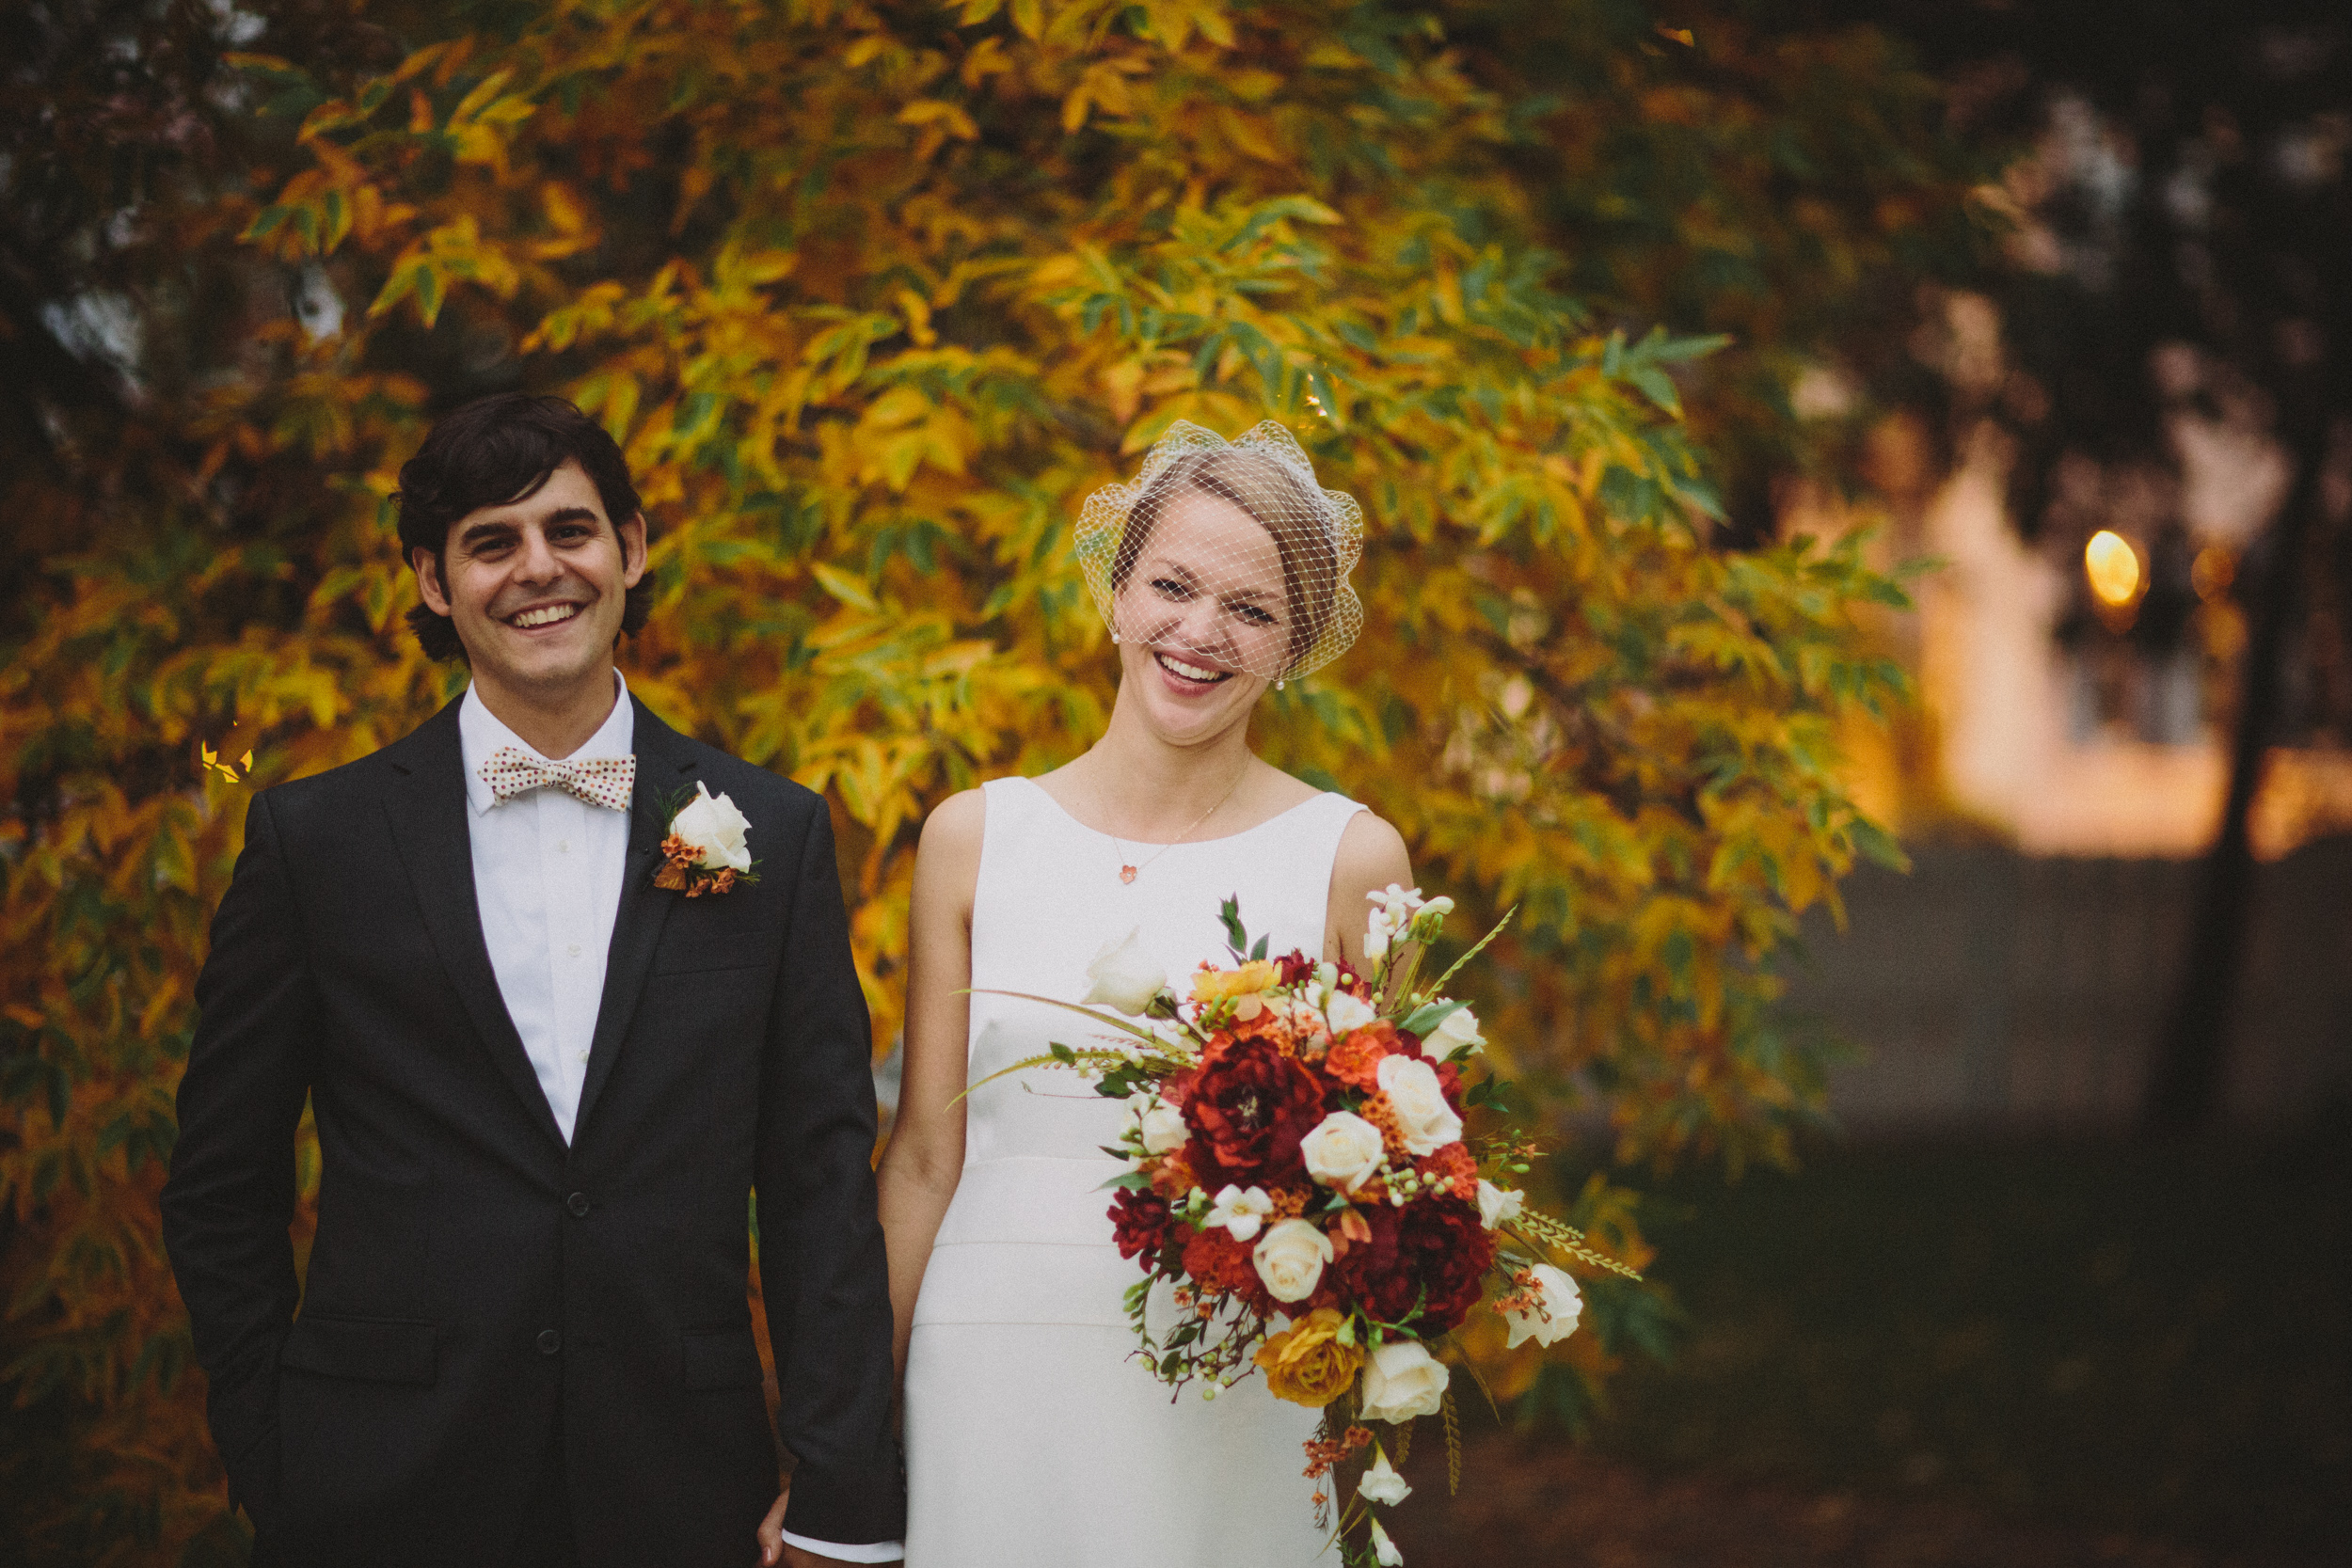 10-05-2013 maggie & adam wedding photography by brian milo-151.jpg